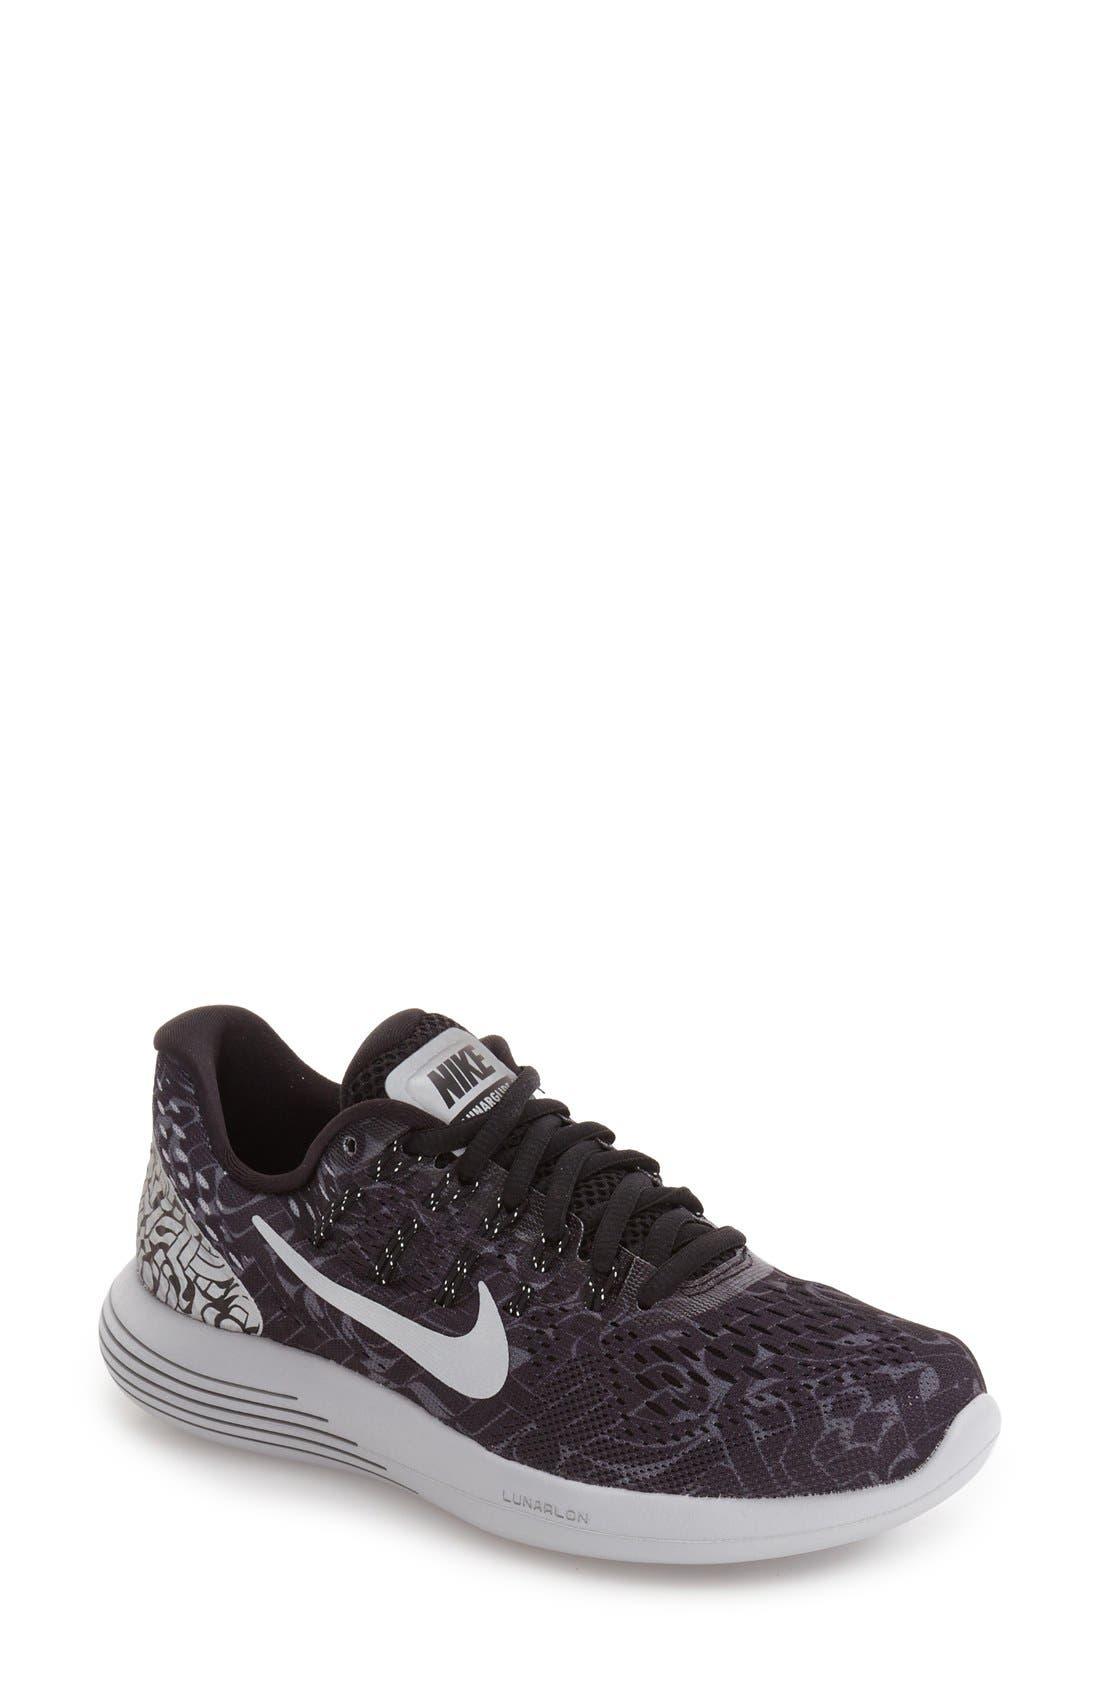 Main Image - Nike Rostarr LunarGlide 8 Running Shoe (Women)